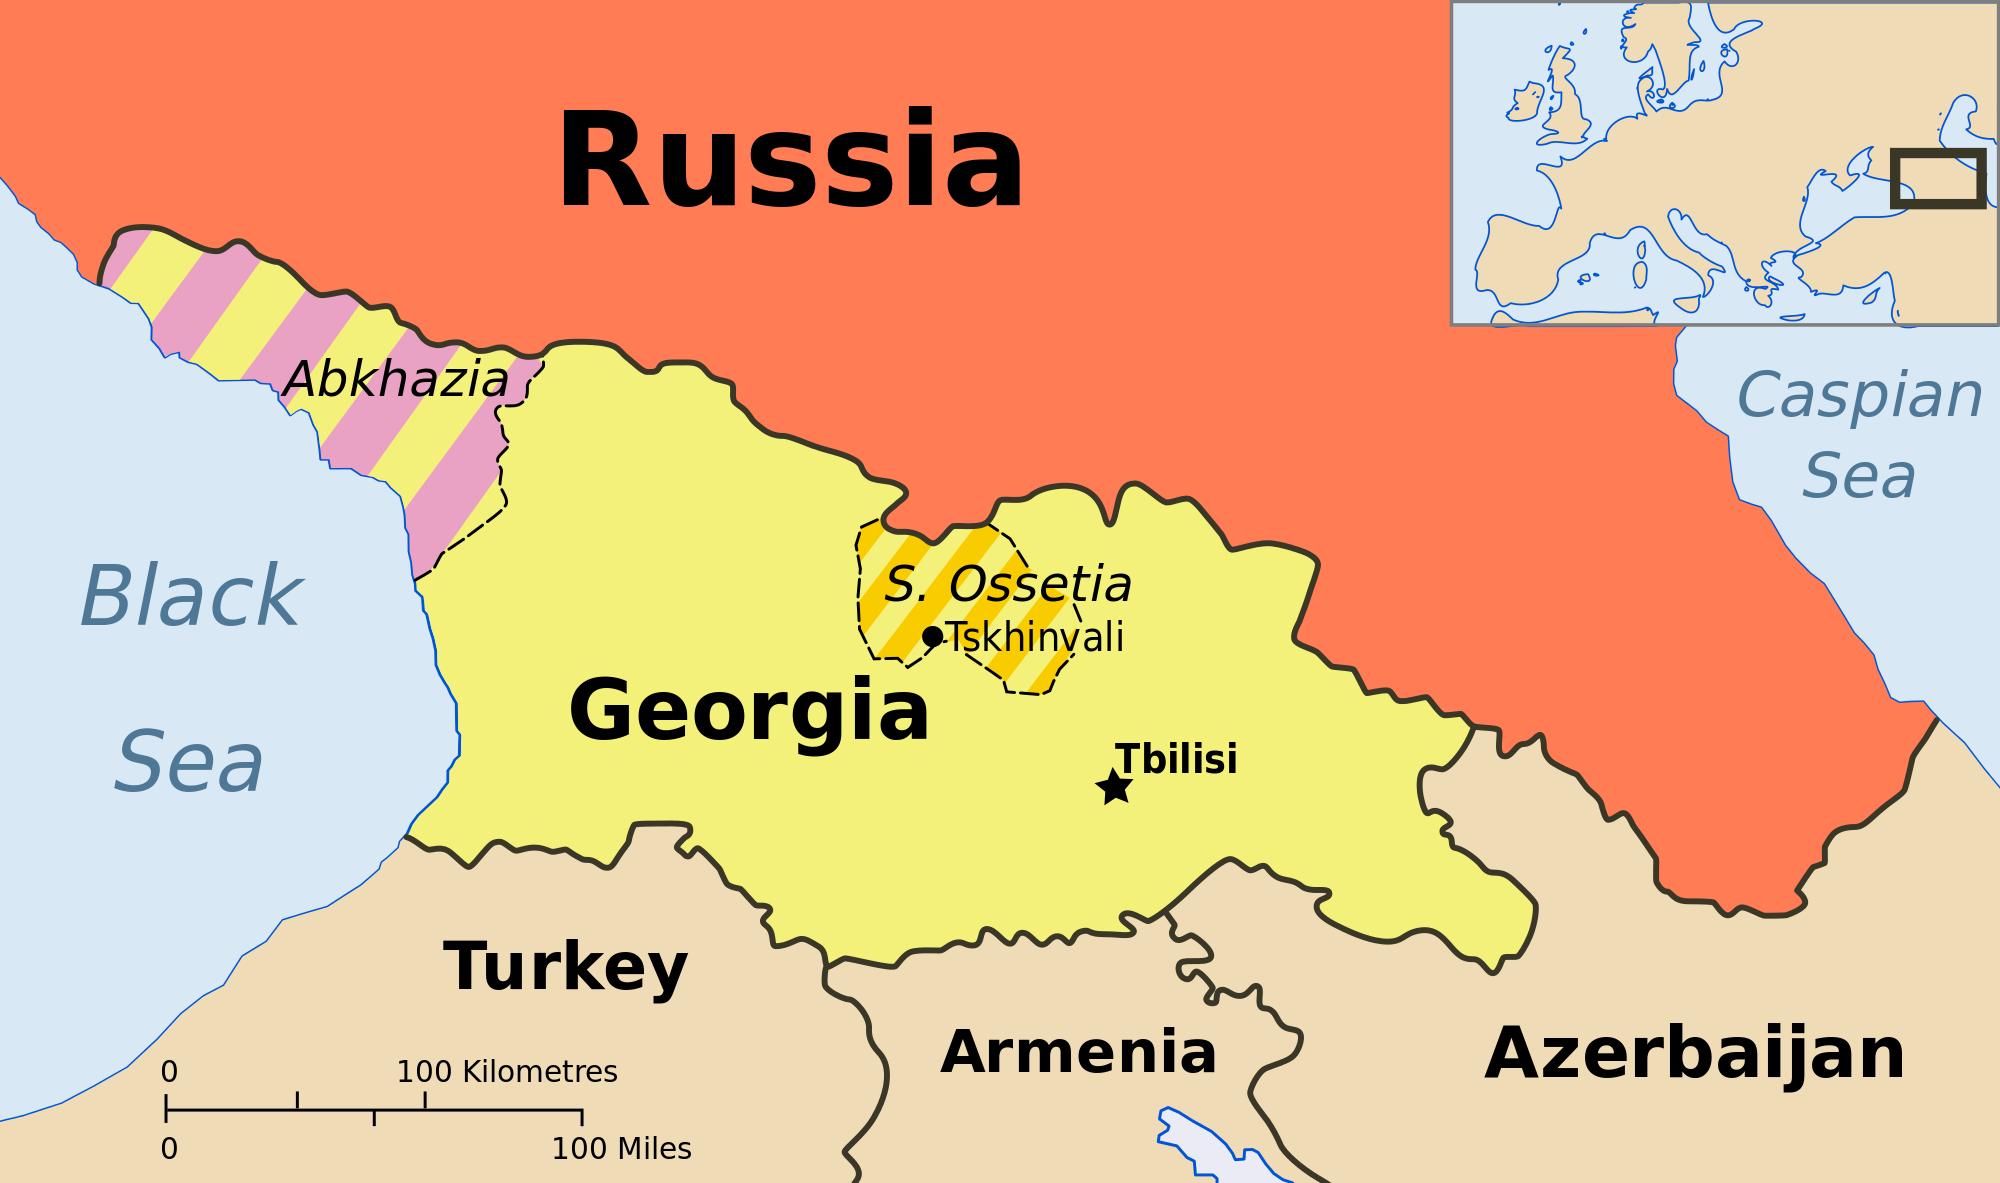 Abkhazia and South Ossetia [Wikipedia]